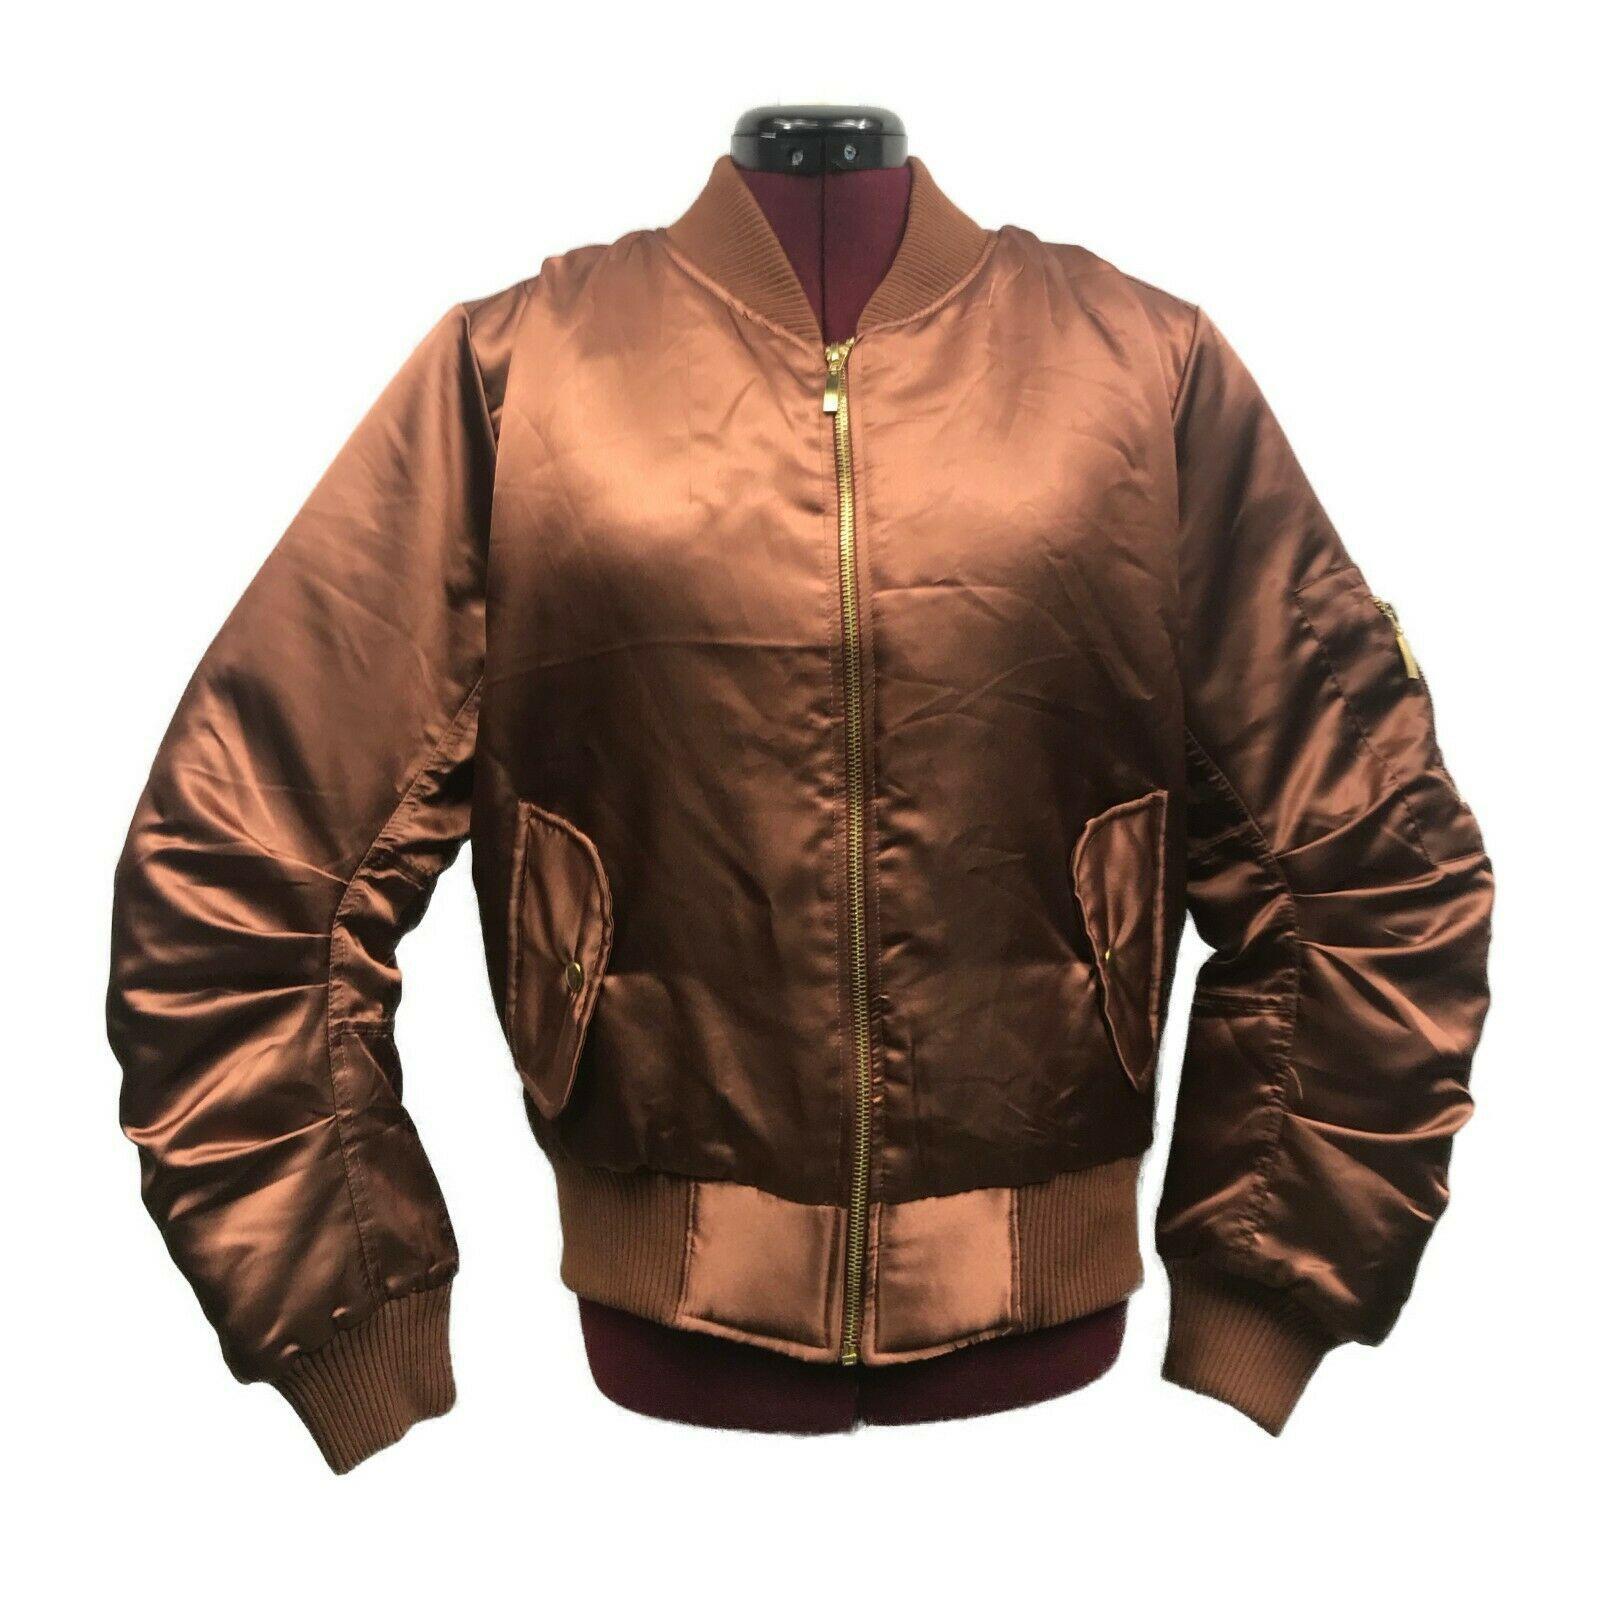 My Ebay Active In 2020 Satin Bomber Jacket Bronze Bomber Bomber Jacket [ 1600 x 1600 Pixel ]